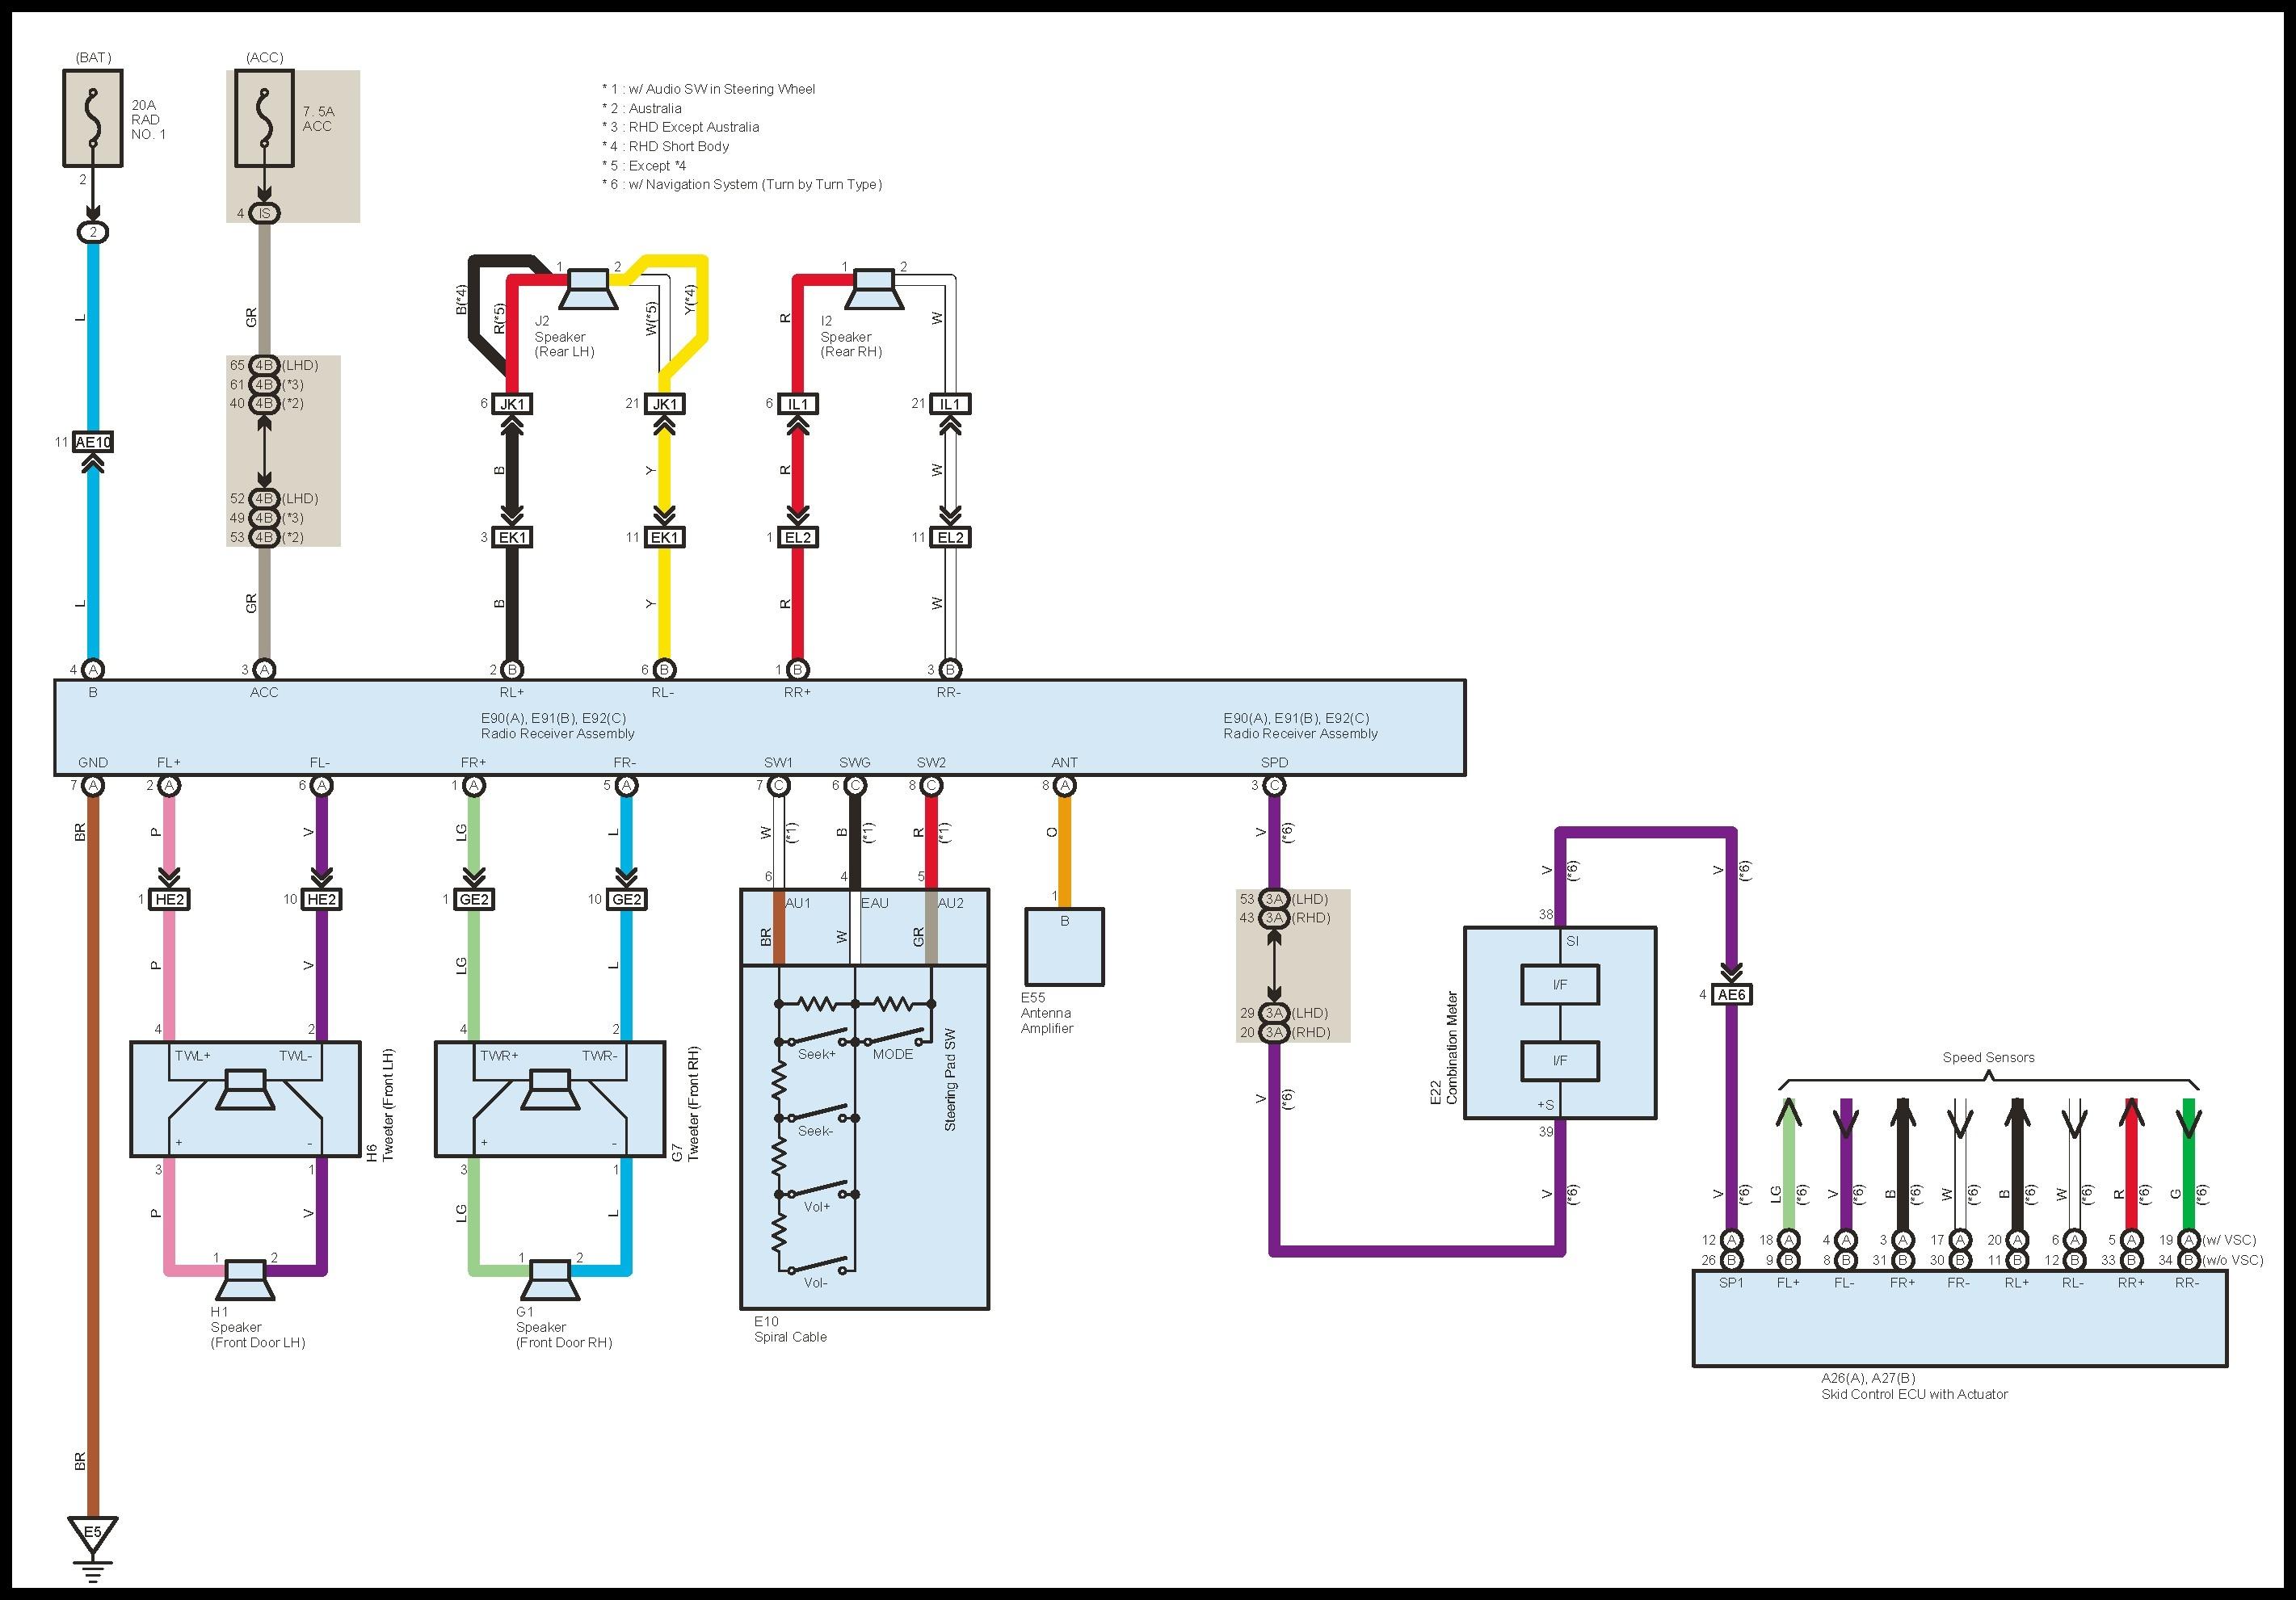 2000 toyota corolla radio wiring diagram hncdesignperu rh hncdesignperu 2004 Toyota RAV4 2005 Toyota RAV4